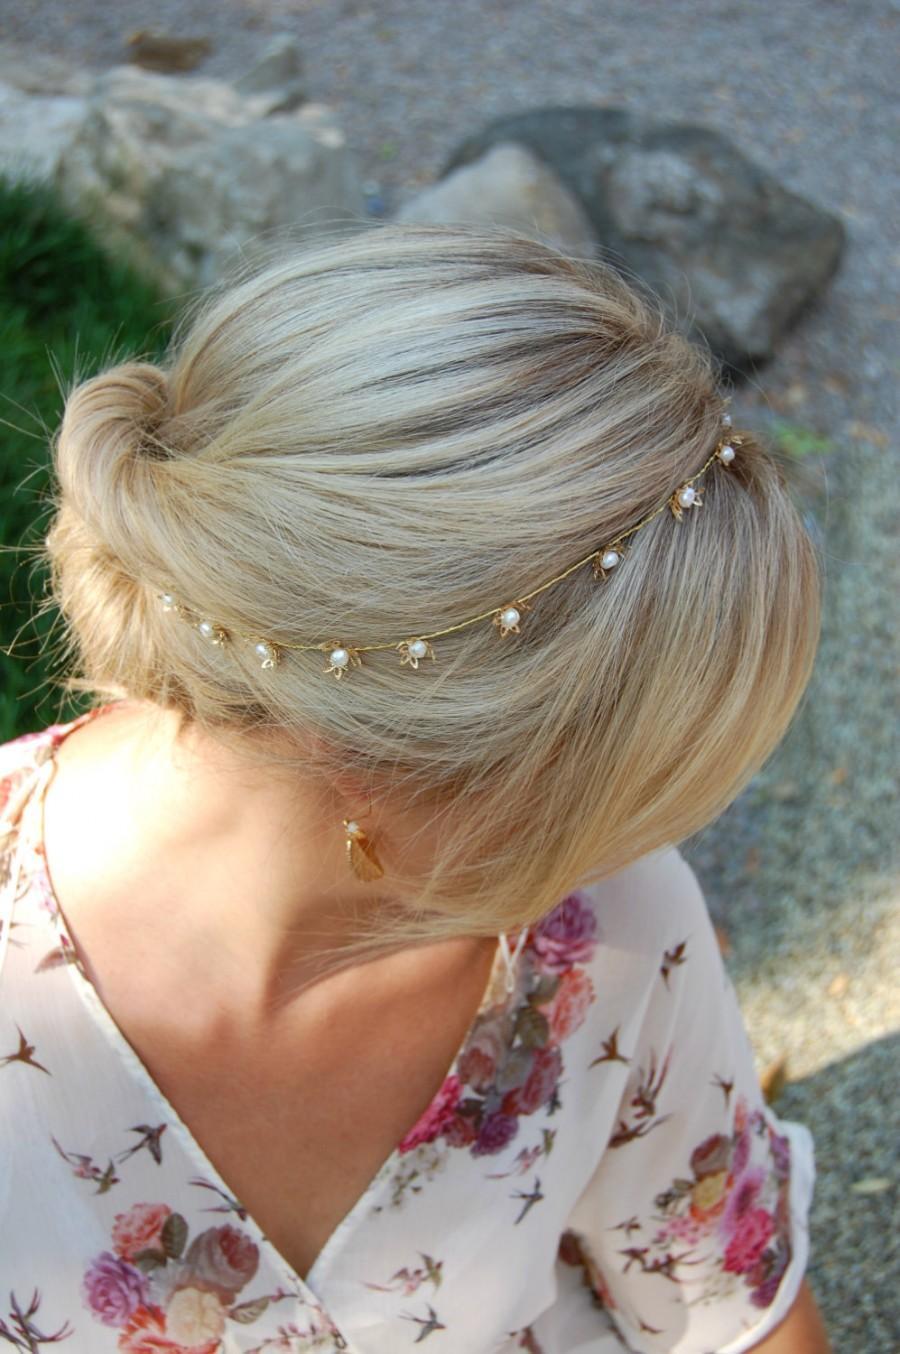 Mariage - pearl,bridal Crown headpiece, pearl tiara, flower crown,Bridal HeadBand, Bridal Halo, Bridal Hair Vine, Tiara, Diadem, Veil Bridal Hairpiece